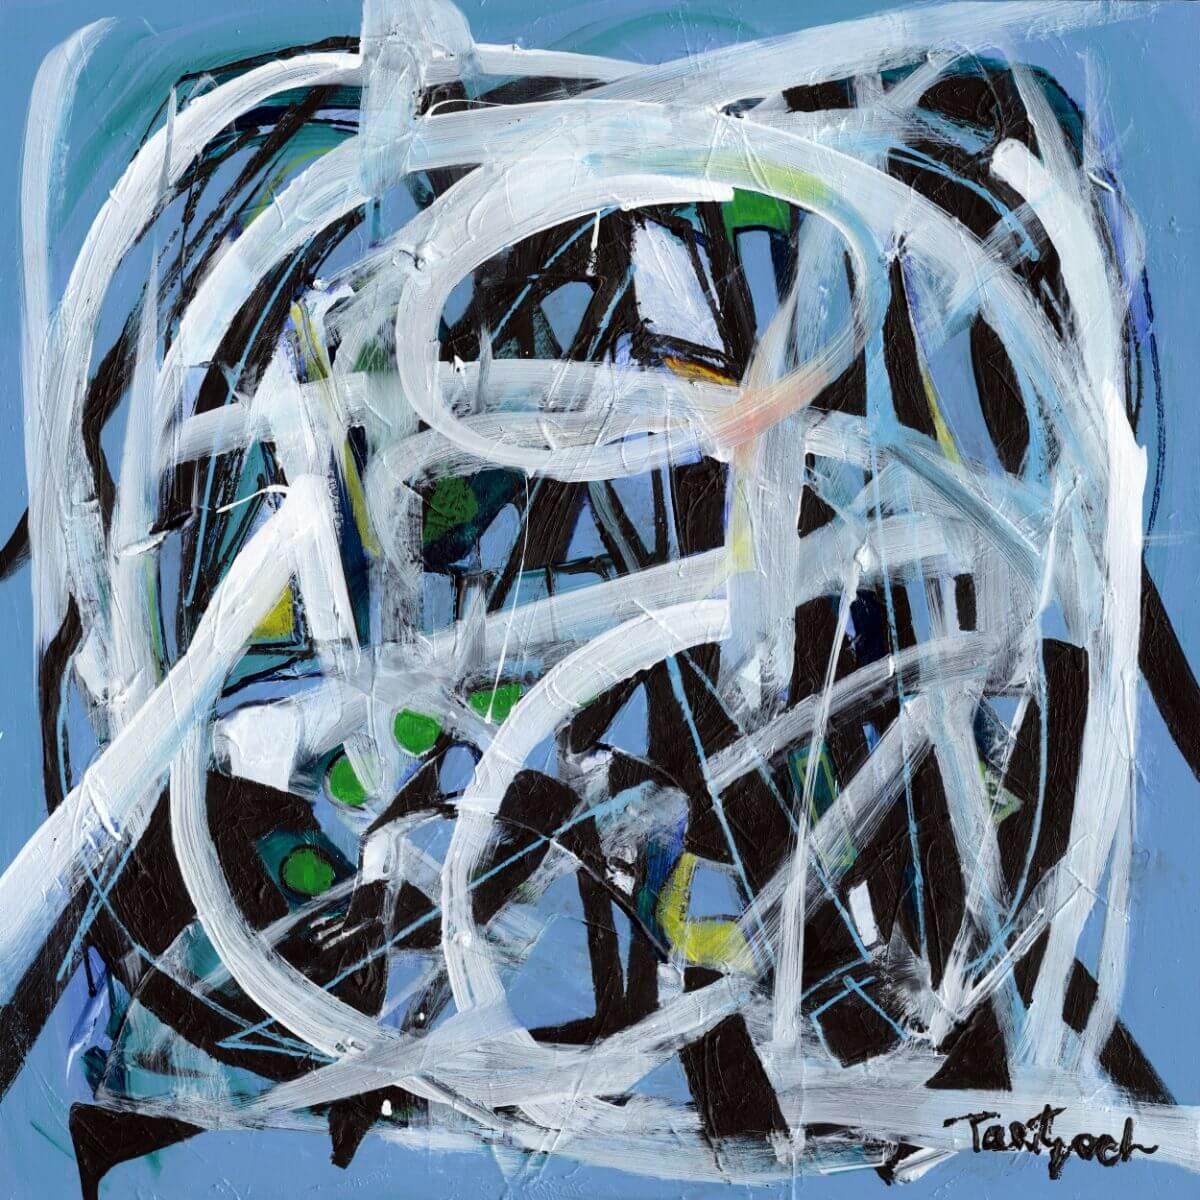 Inside Blue | Artistic wedding anniversary present | Wedding Registry for Art